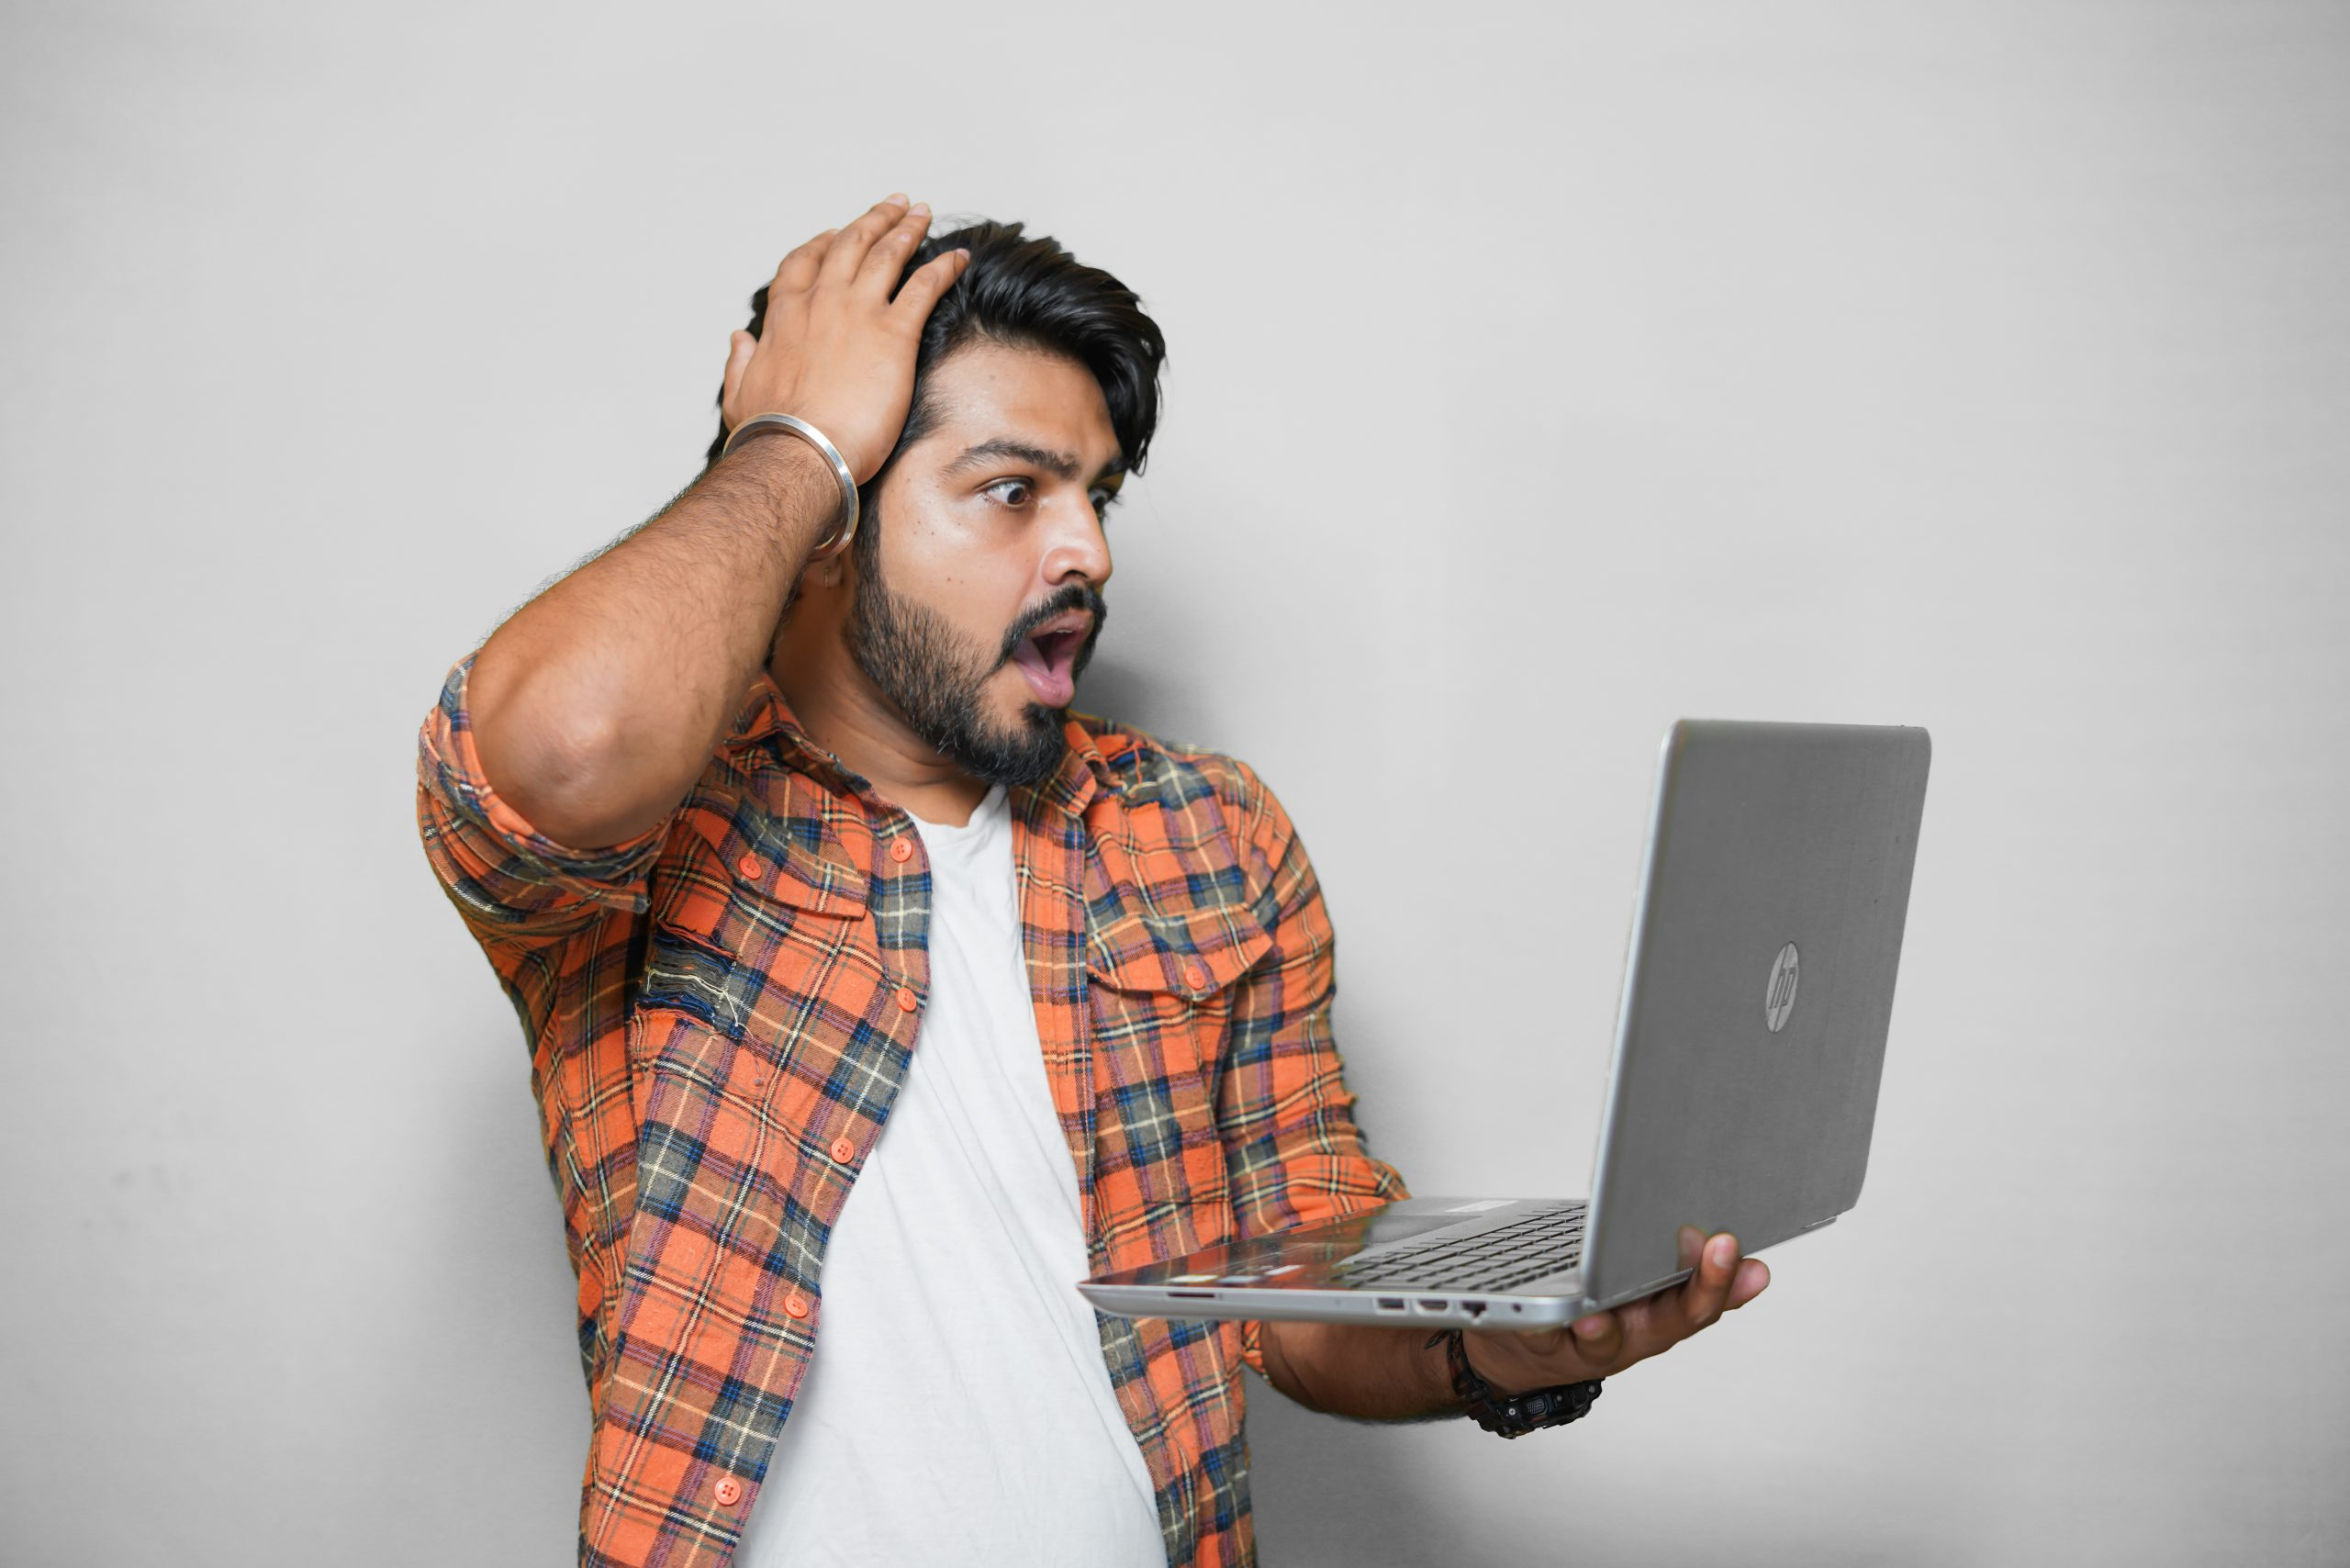 Young man looking shocked seeing something on Laptop